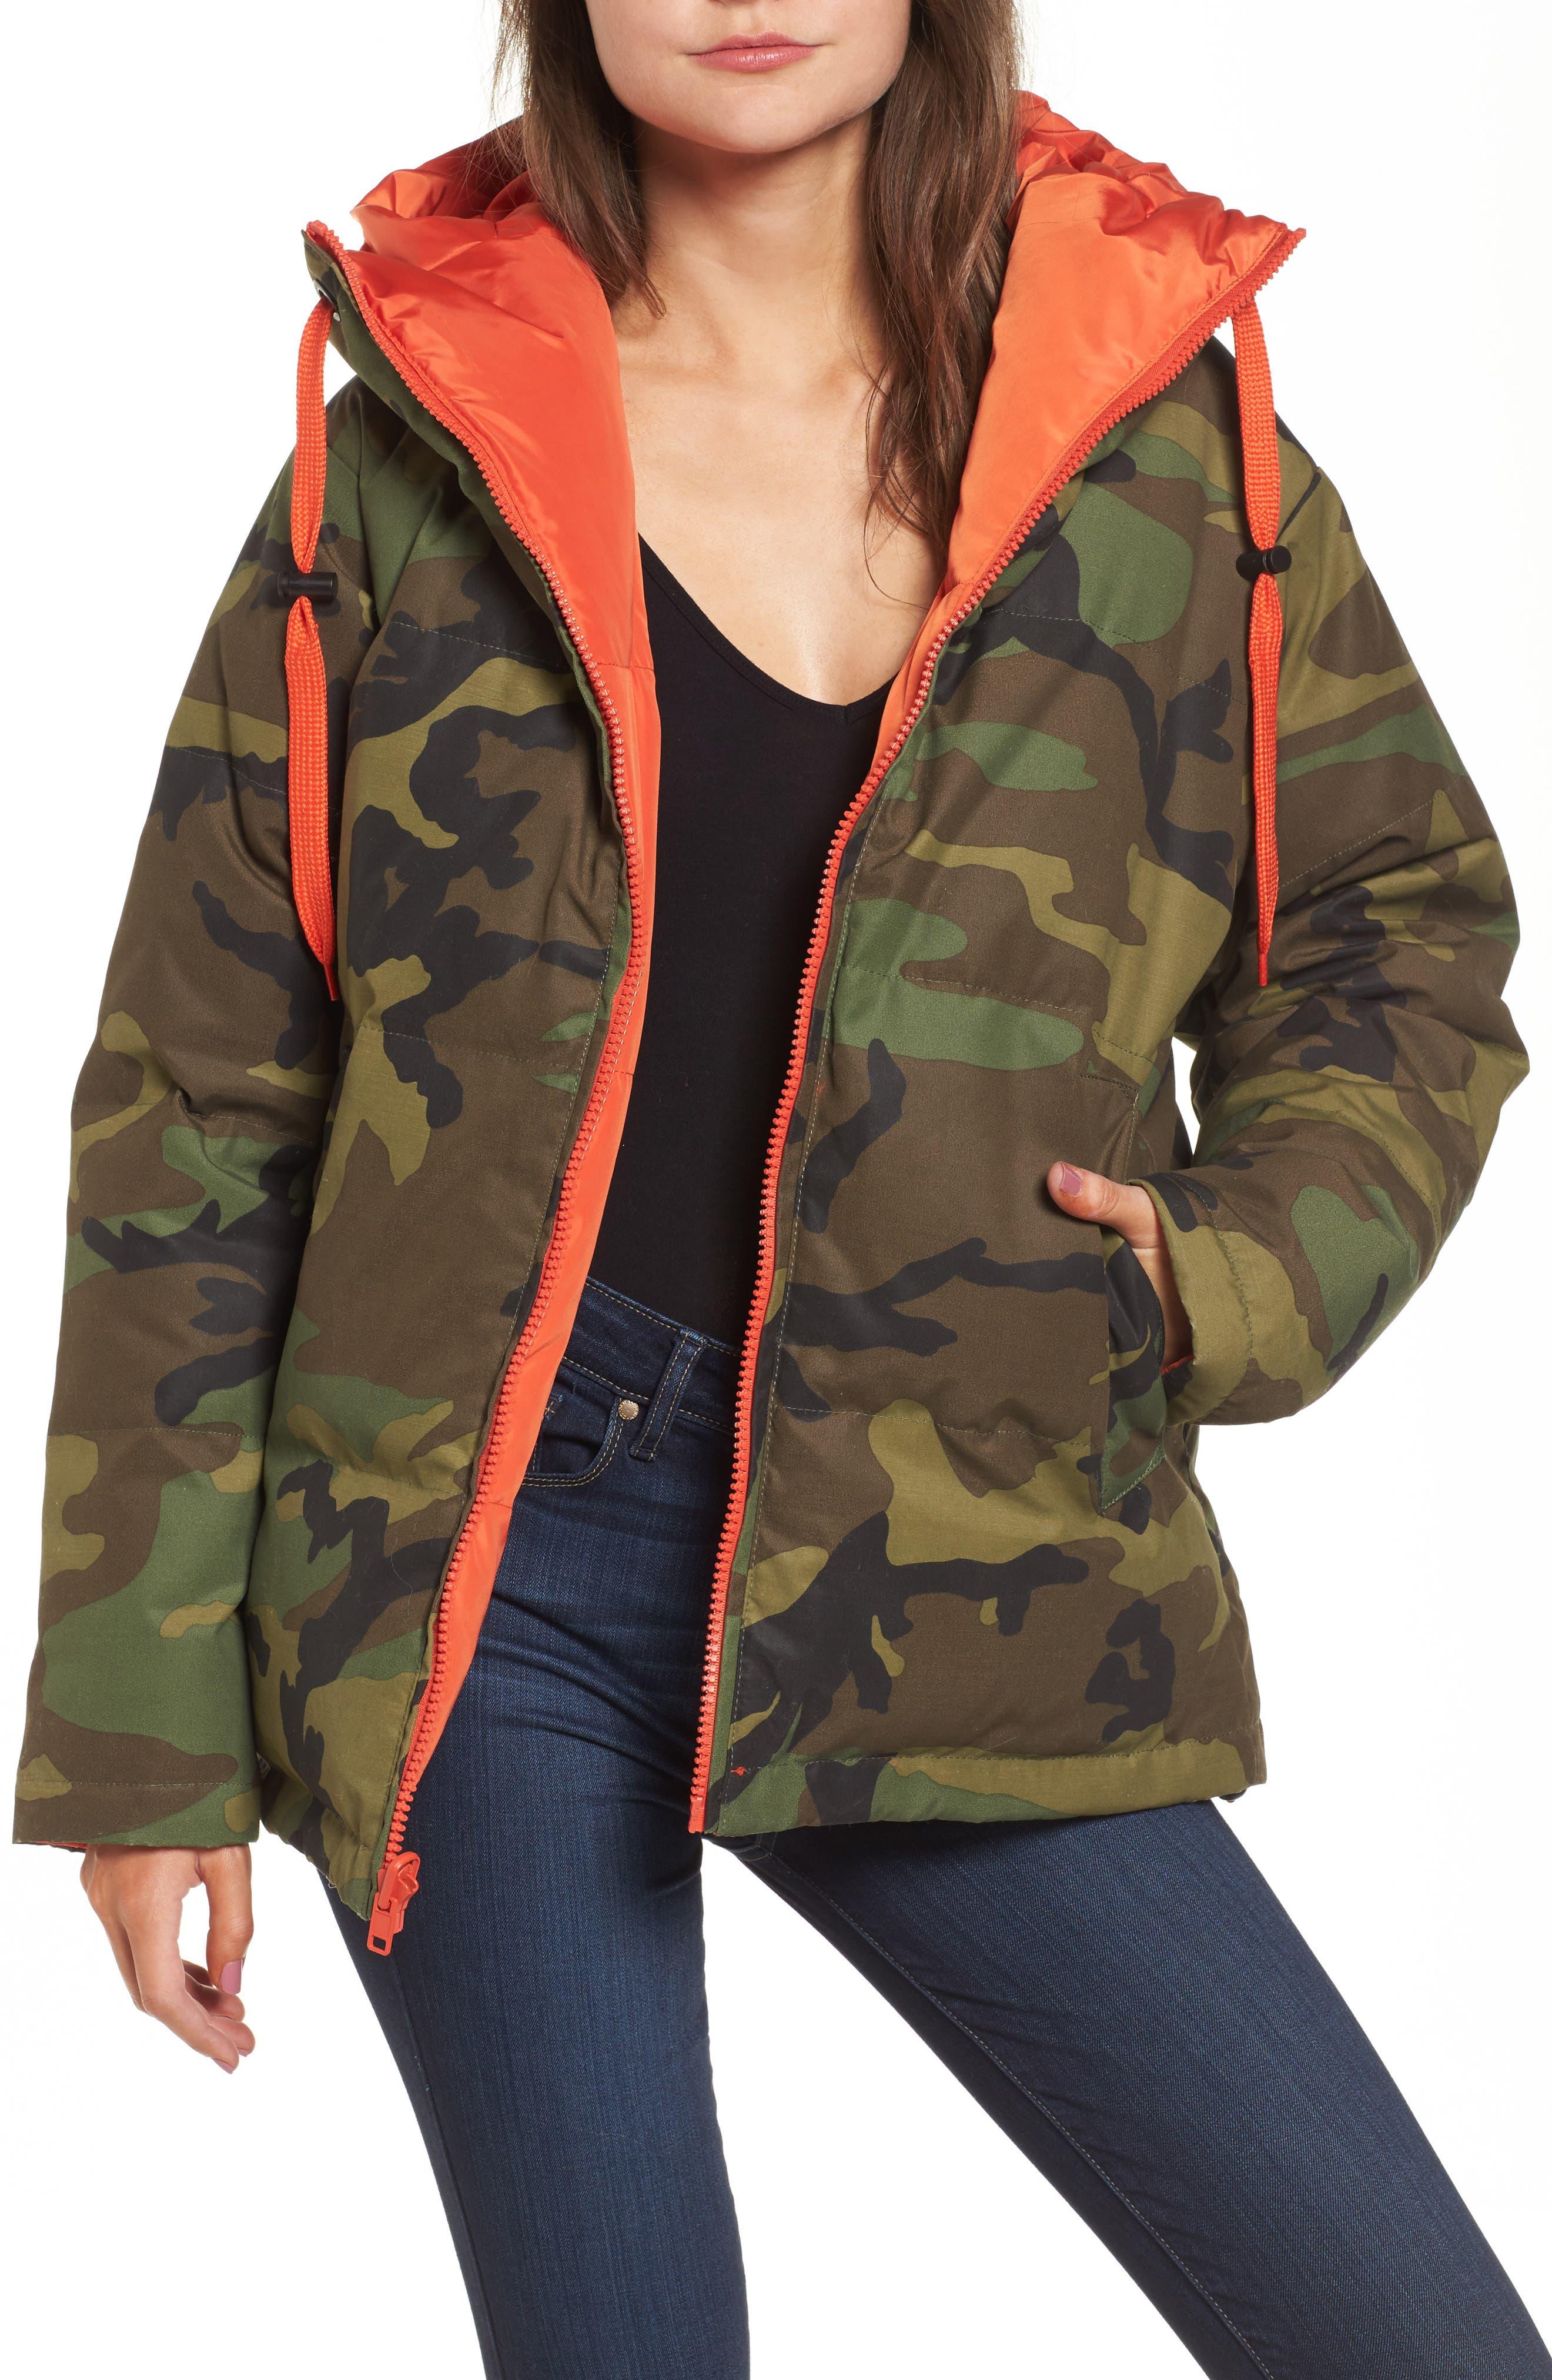 Reversible Puffer Jacket,                             Main thumbnail 1, color,                             Camo/ Orange